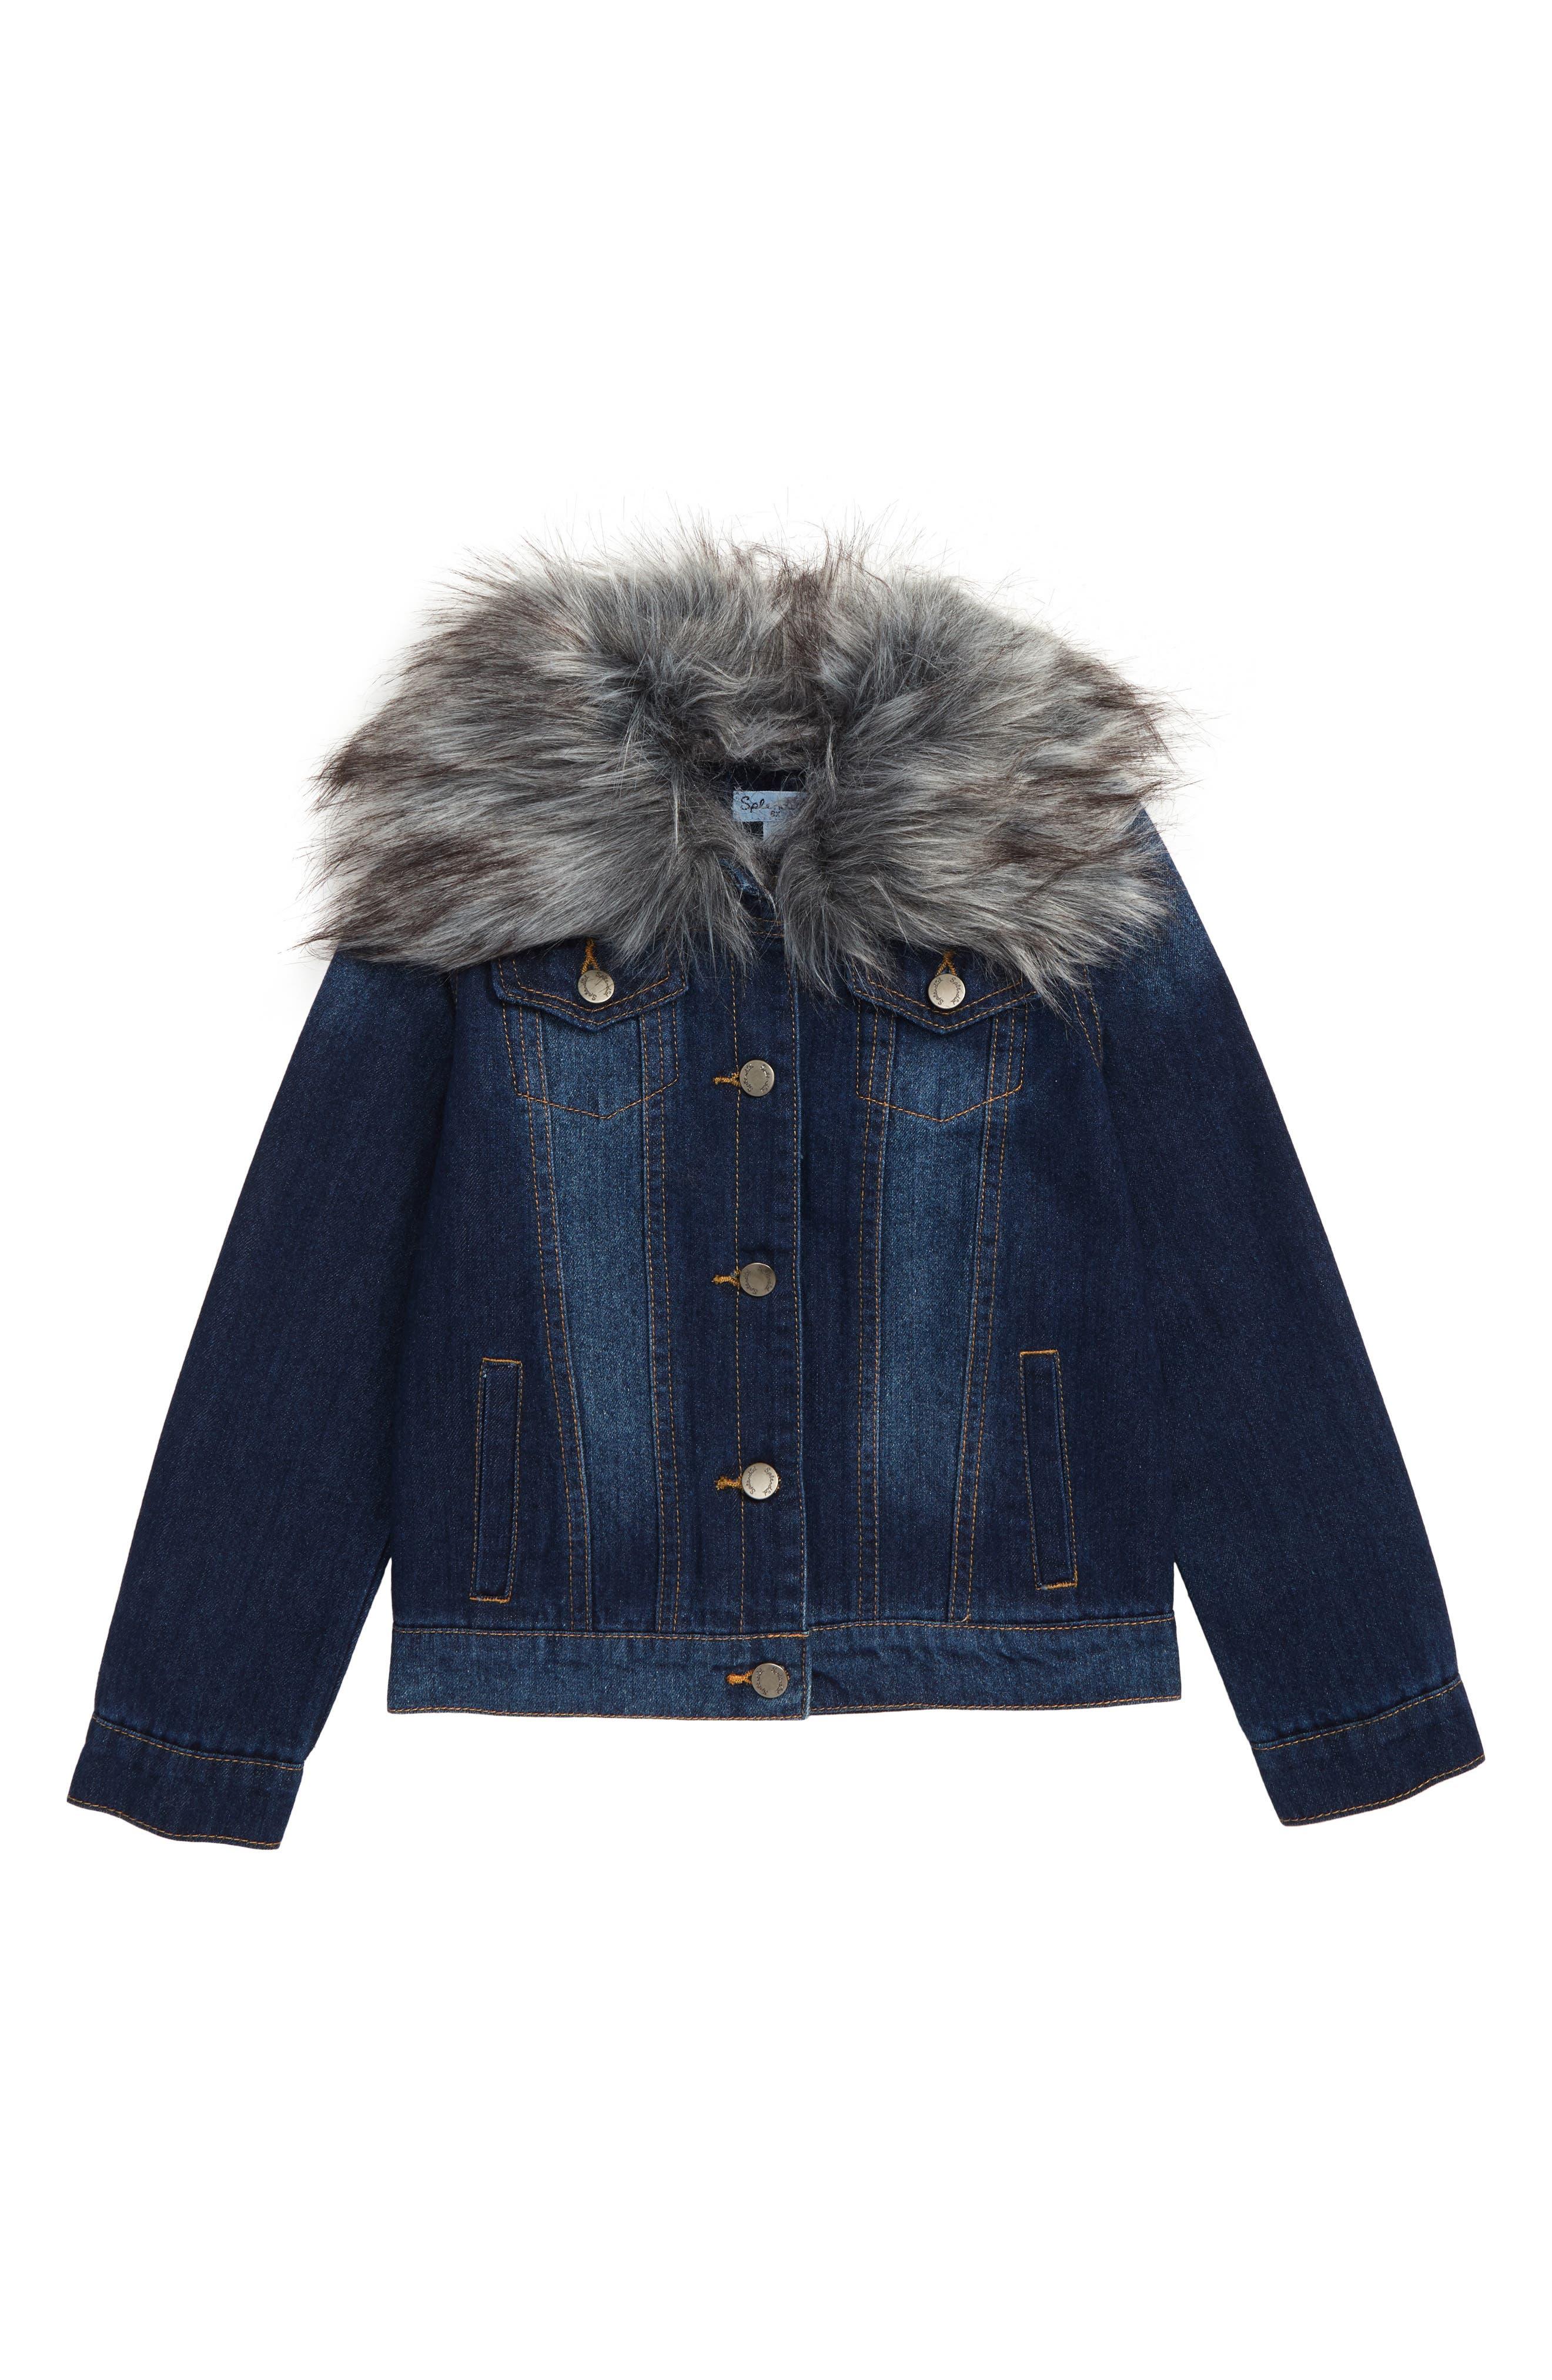 Denim Jacket with Removable Faux Fur Collar,                             Main thumbnail 1, color,                             MEDIUM STONE